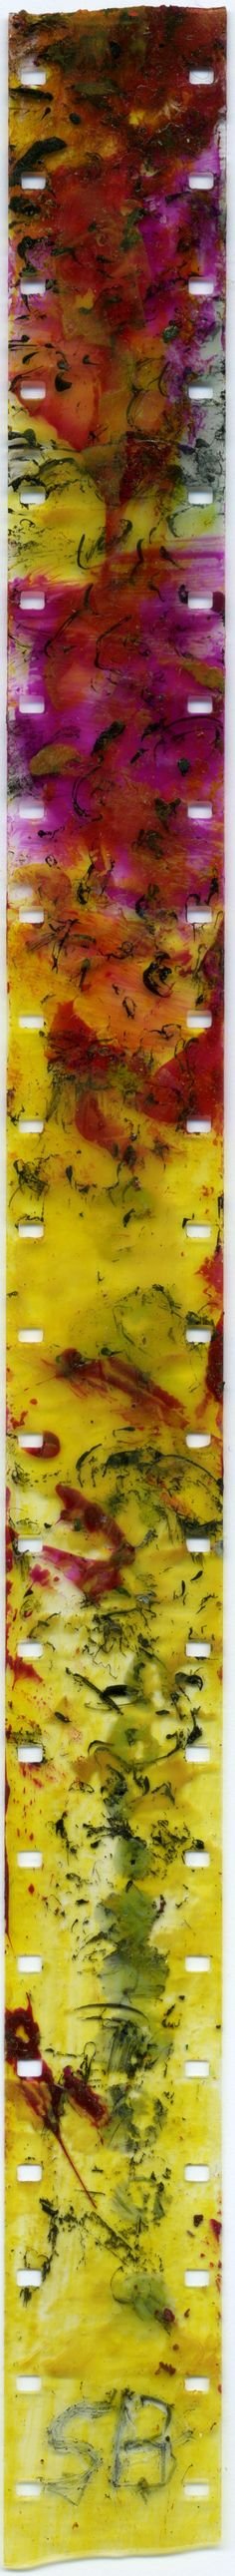 Film Strip by Stan Brakhage. Image Courtesy of the University of Colorado at Boulder.